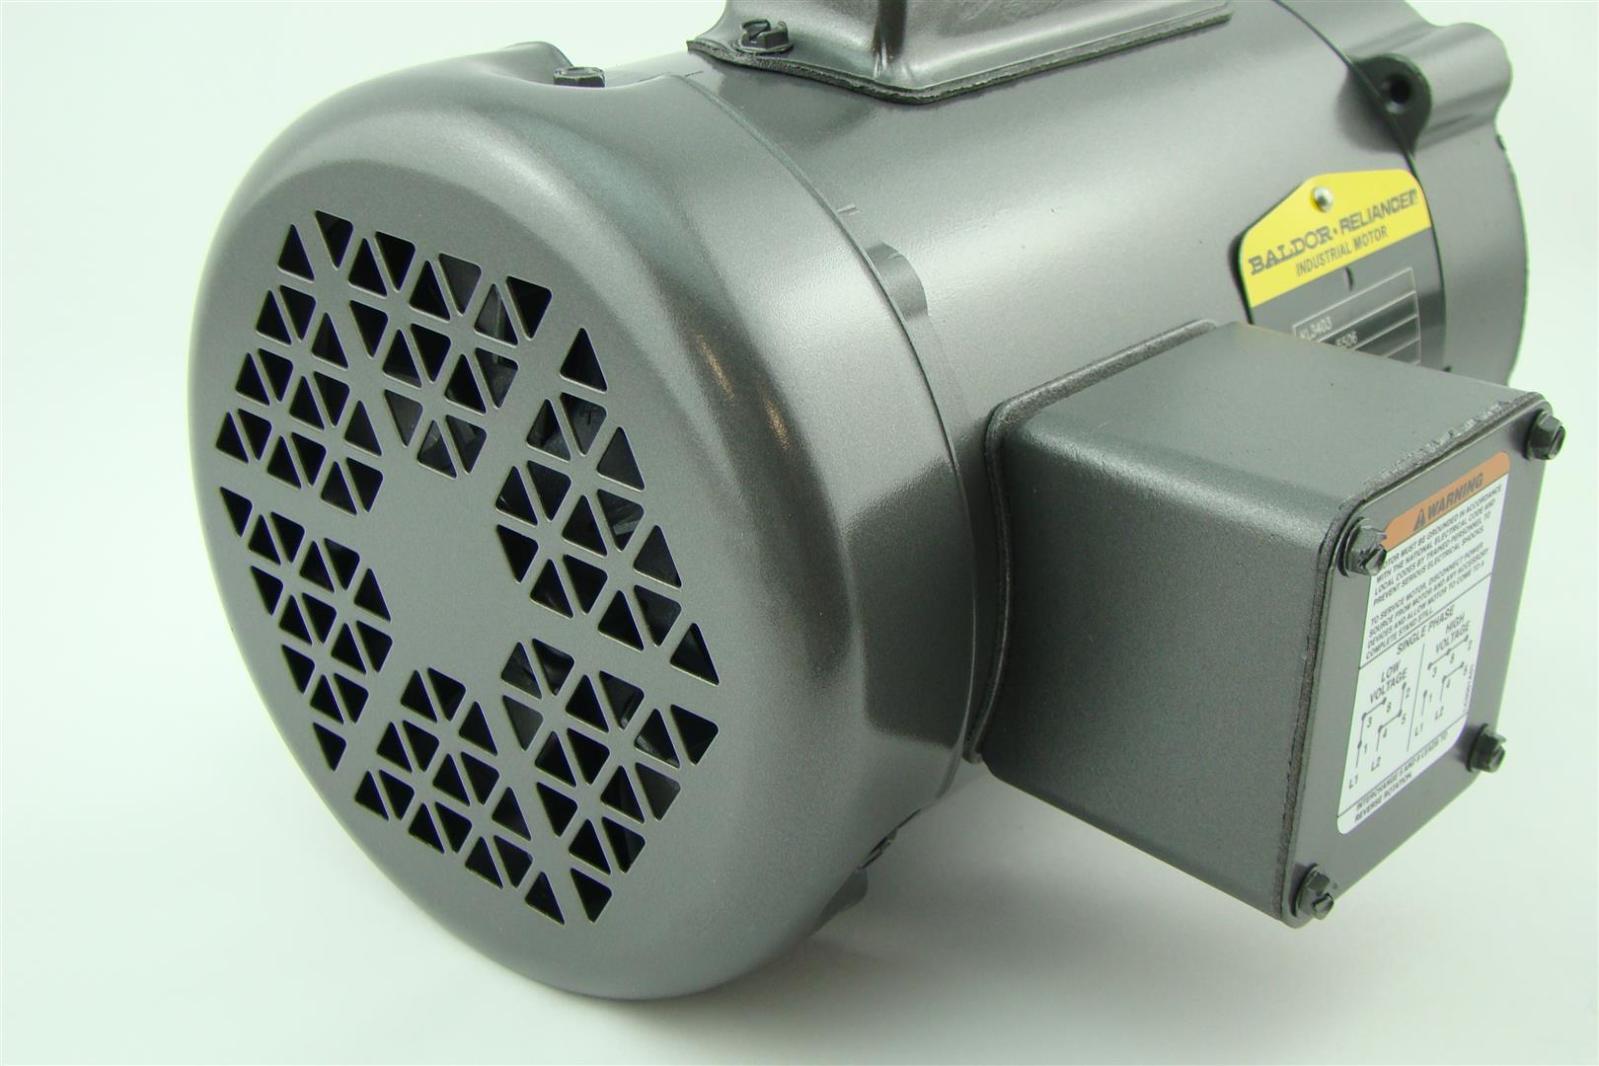 Baldor reliancer industrial motor 25hp 115 230v single for Baldor 2 hp single phase motor